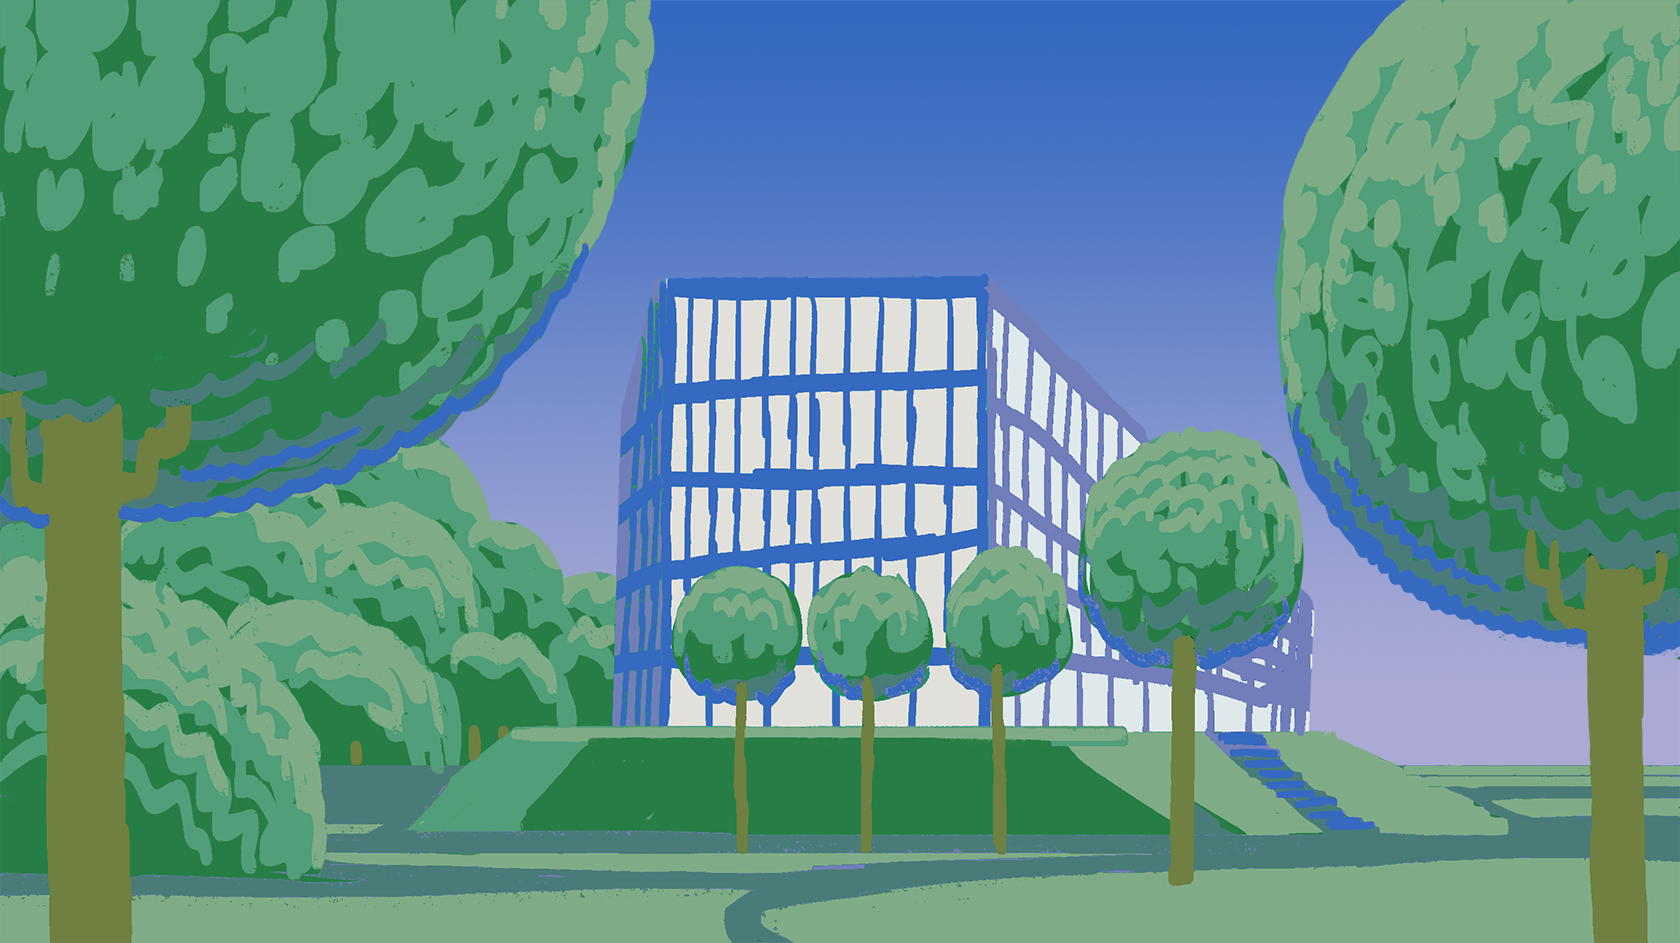 green and blue illustration of Kilen building